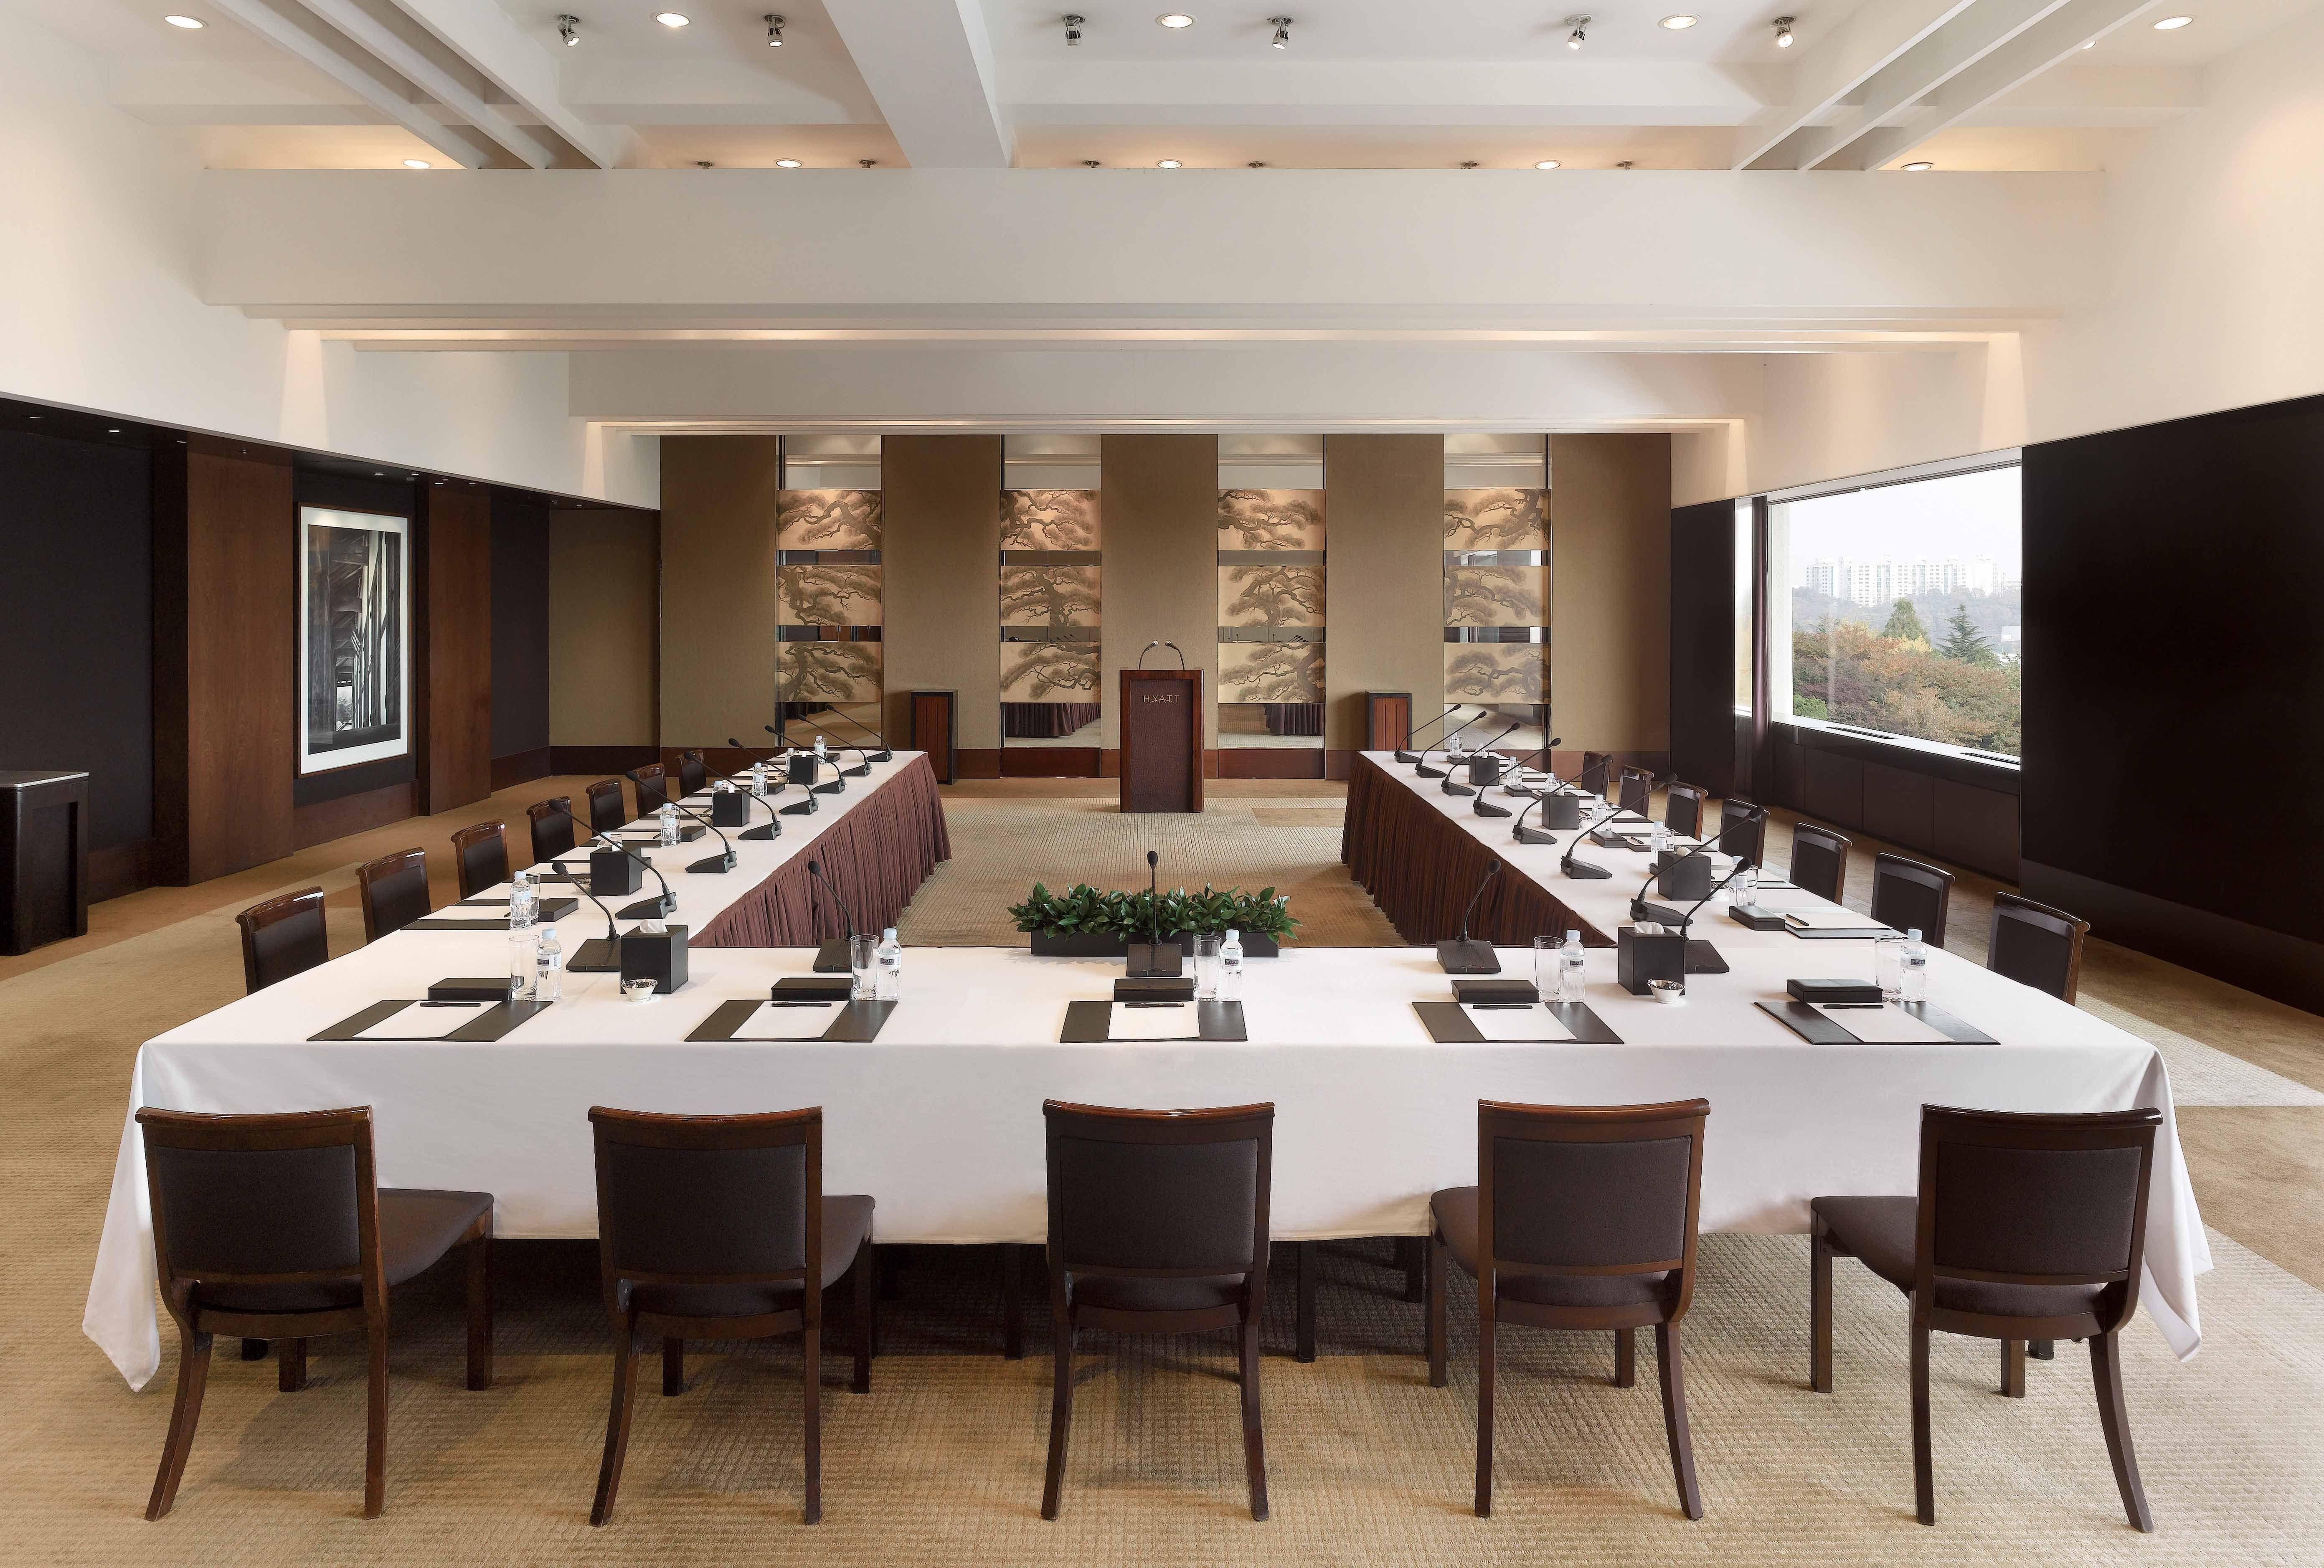 Grand Hyatt Seoul s Namsan I Meeting Room  grandhyattseoul  meetingrooms a2a718702